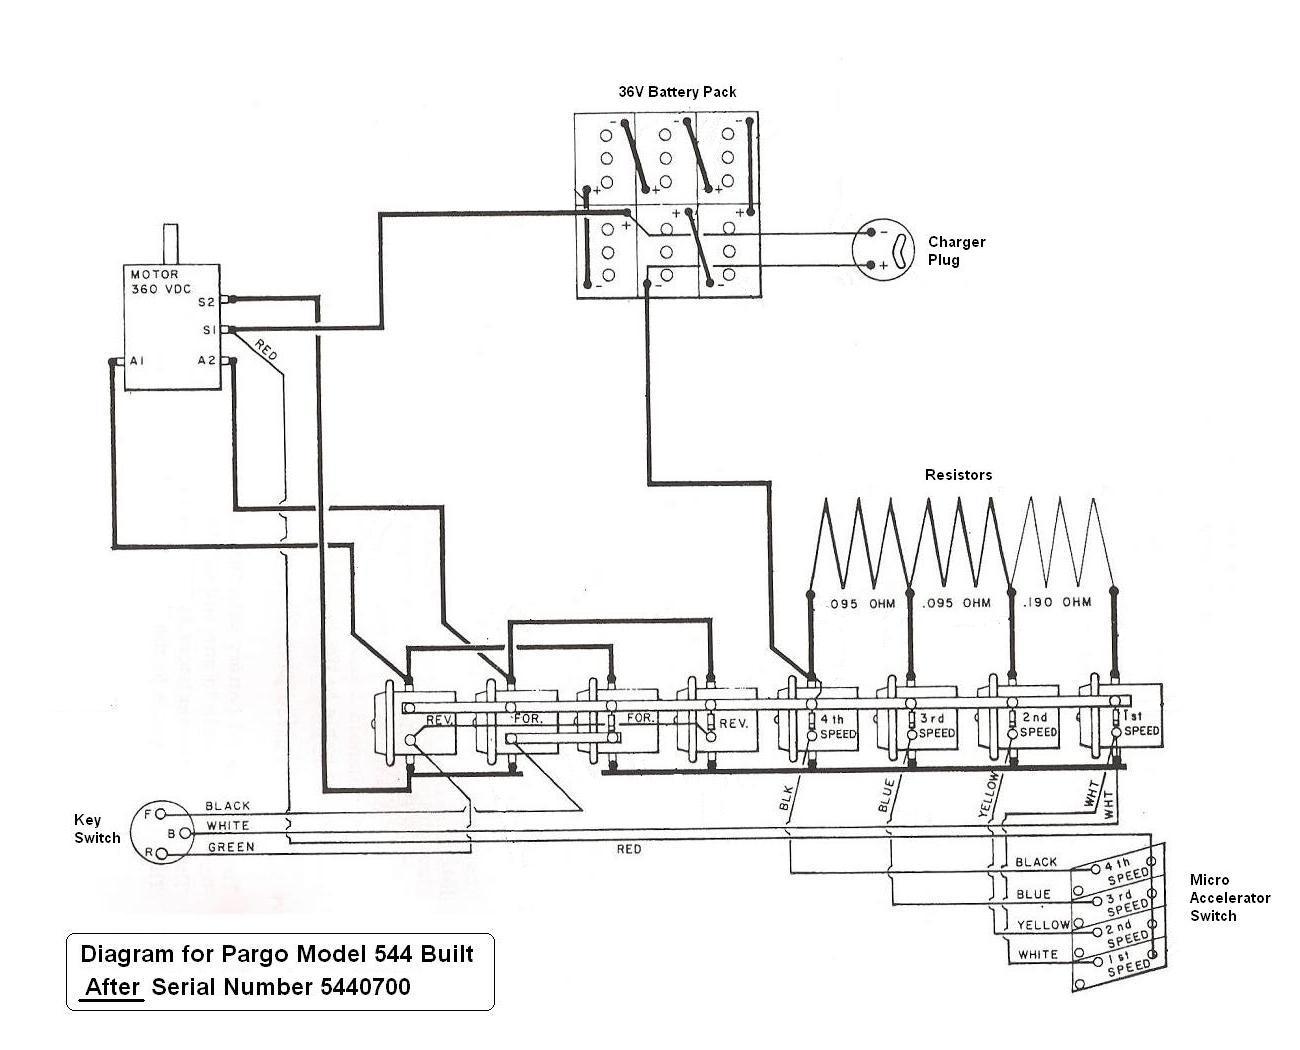 Par Car Wiring Diagram 48 Volt besides 2016 Hyundai Elantra Testing Ahead as well 1971 Johnson 50 Hp Wiring Harness further 36 Volt E Z Go Wiring Diagram likewise Harley Davidson Fog Lights Wiring Diagram. on taylor dunn wiring harness